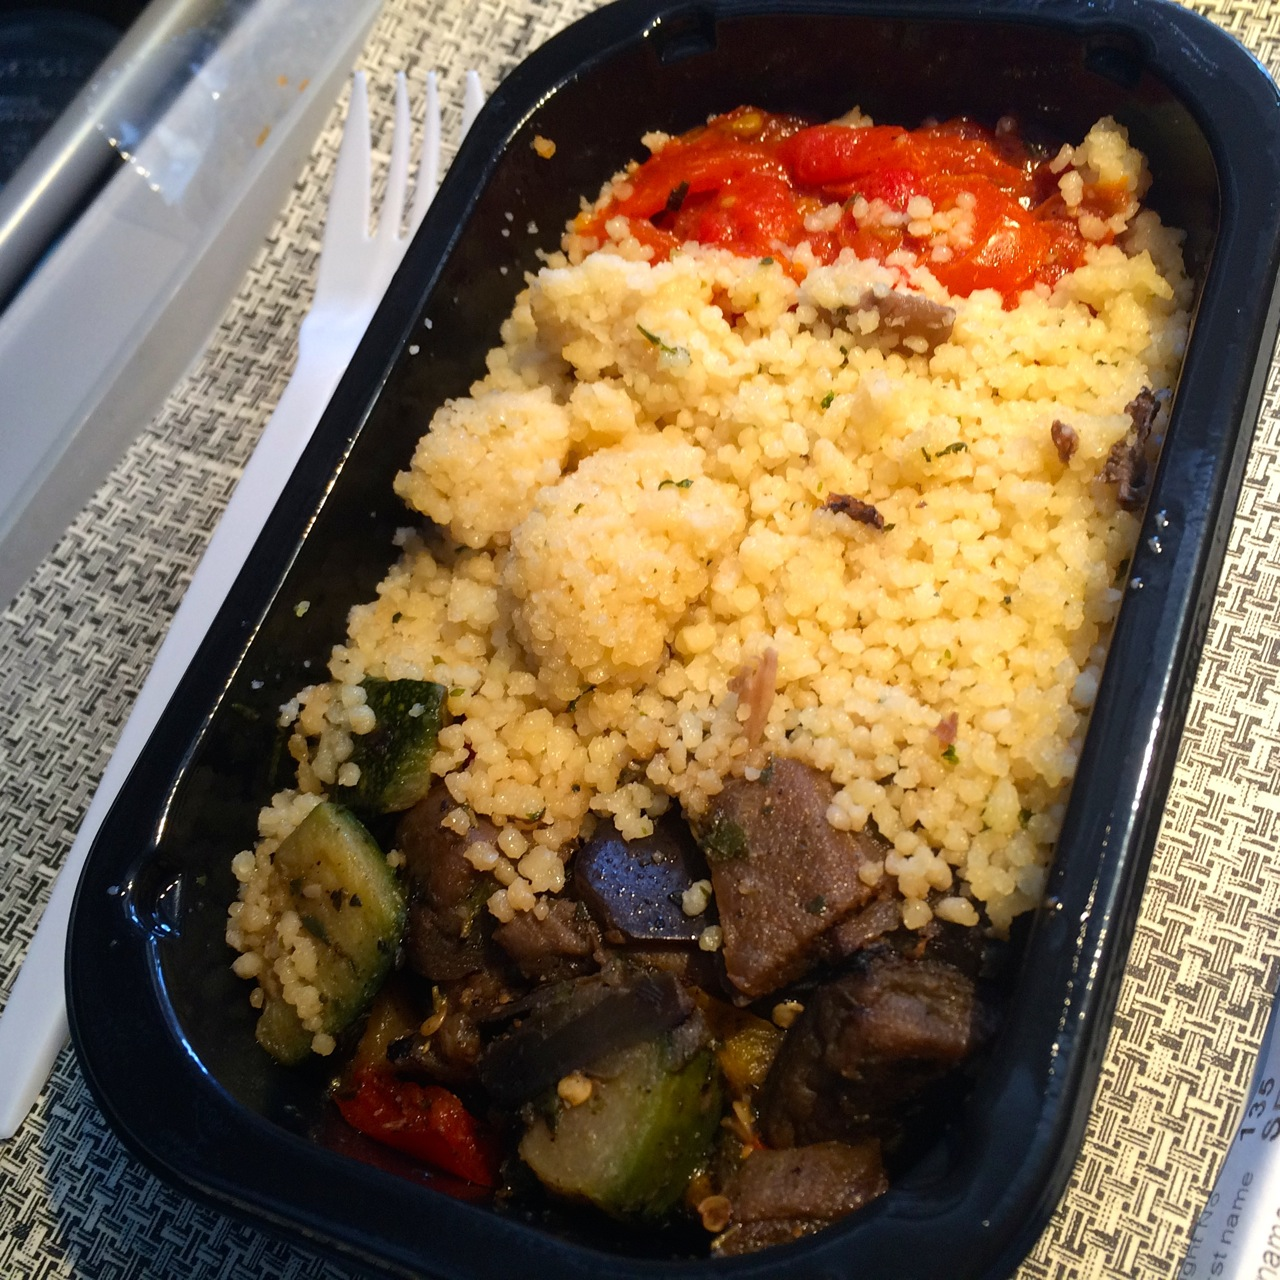 http://i0.wp.com/fatgayvegan.com/wp-content/uploads/2015/05/american-airlines-vegan-meal.jpg?fit=1280%2C1280